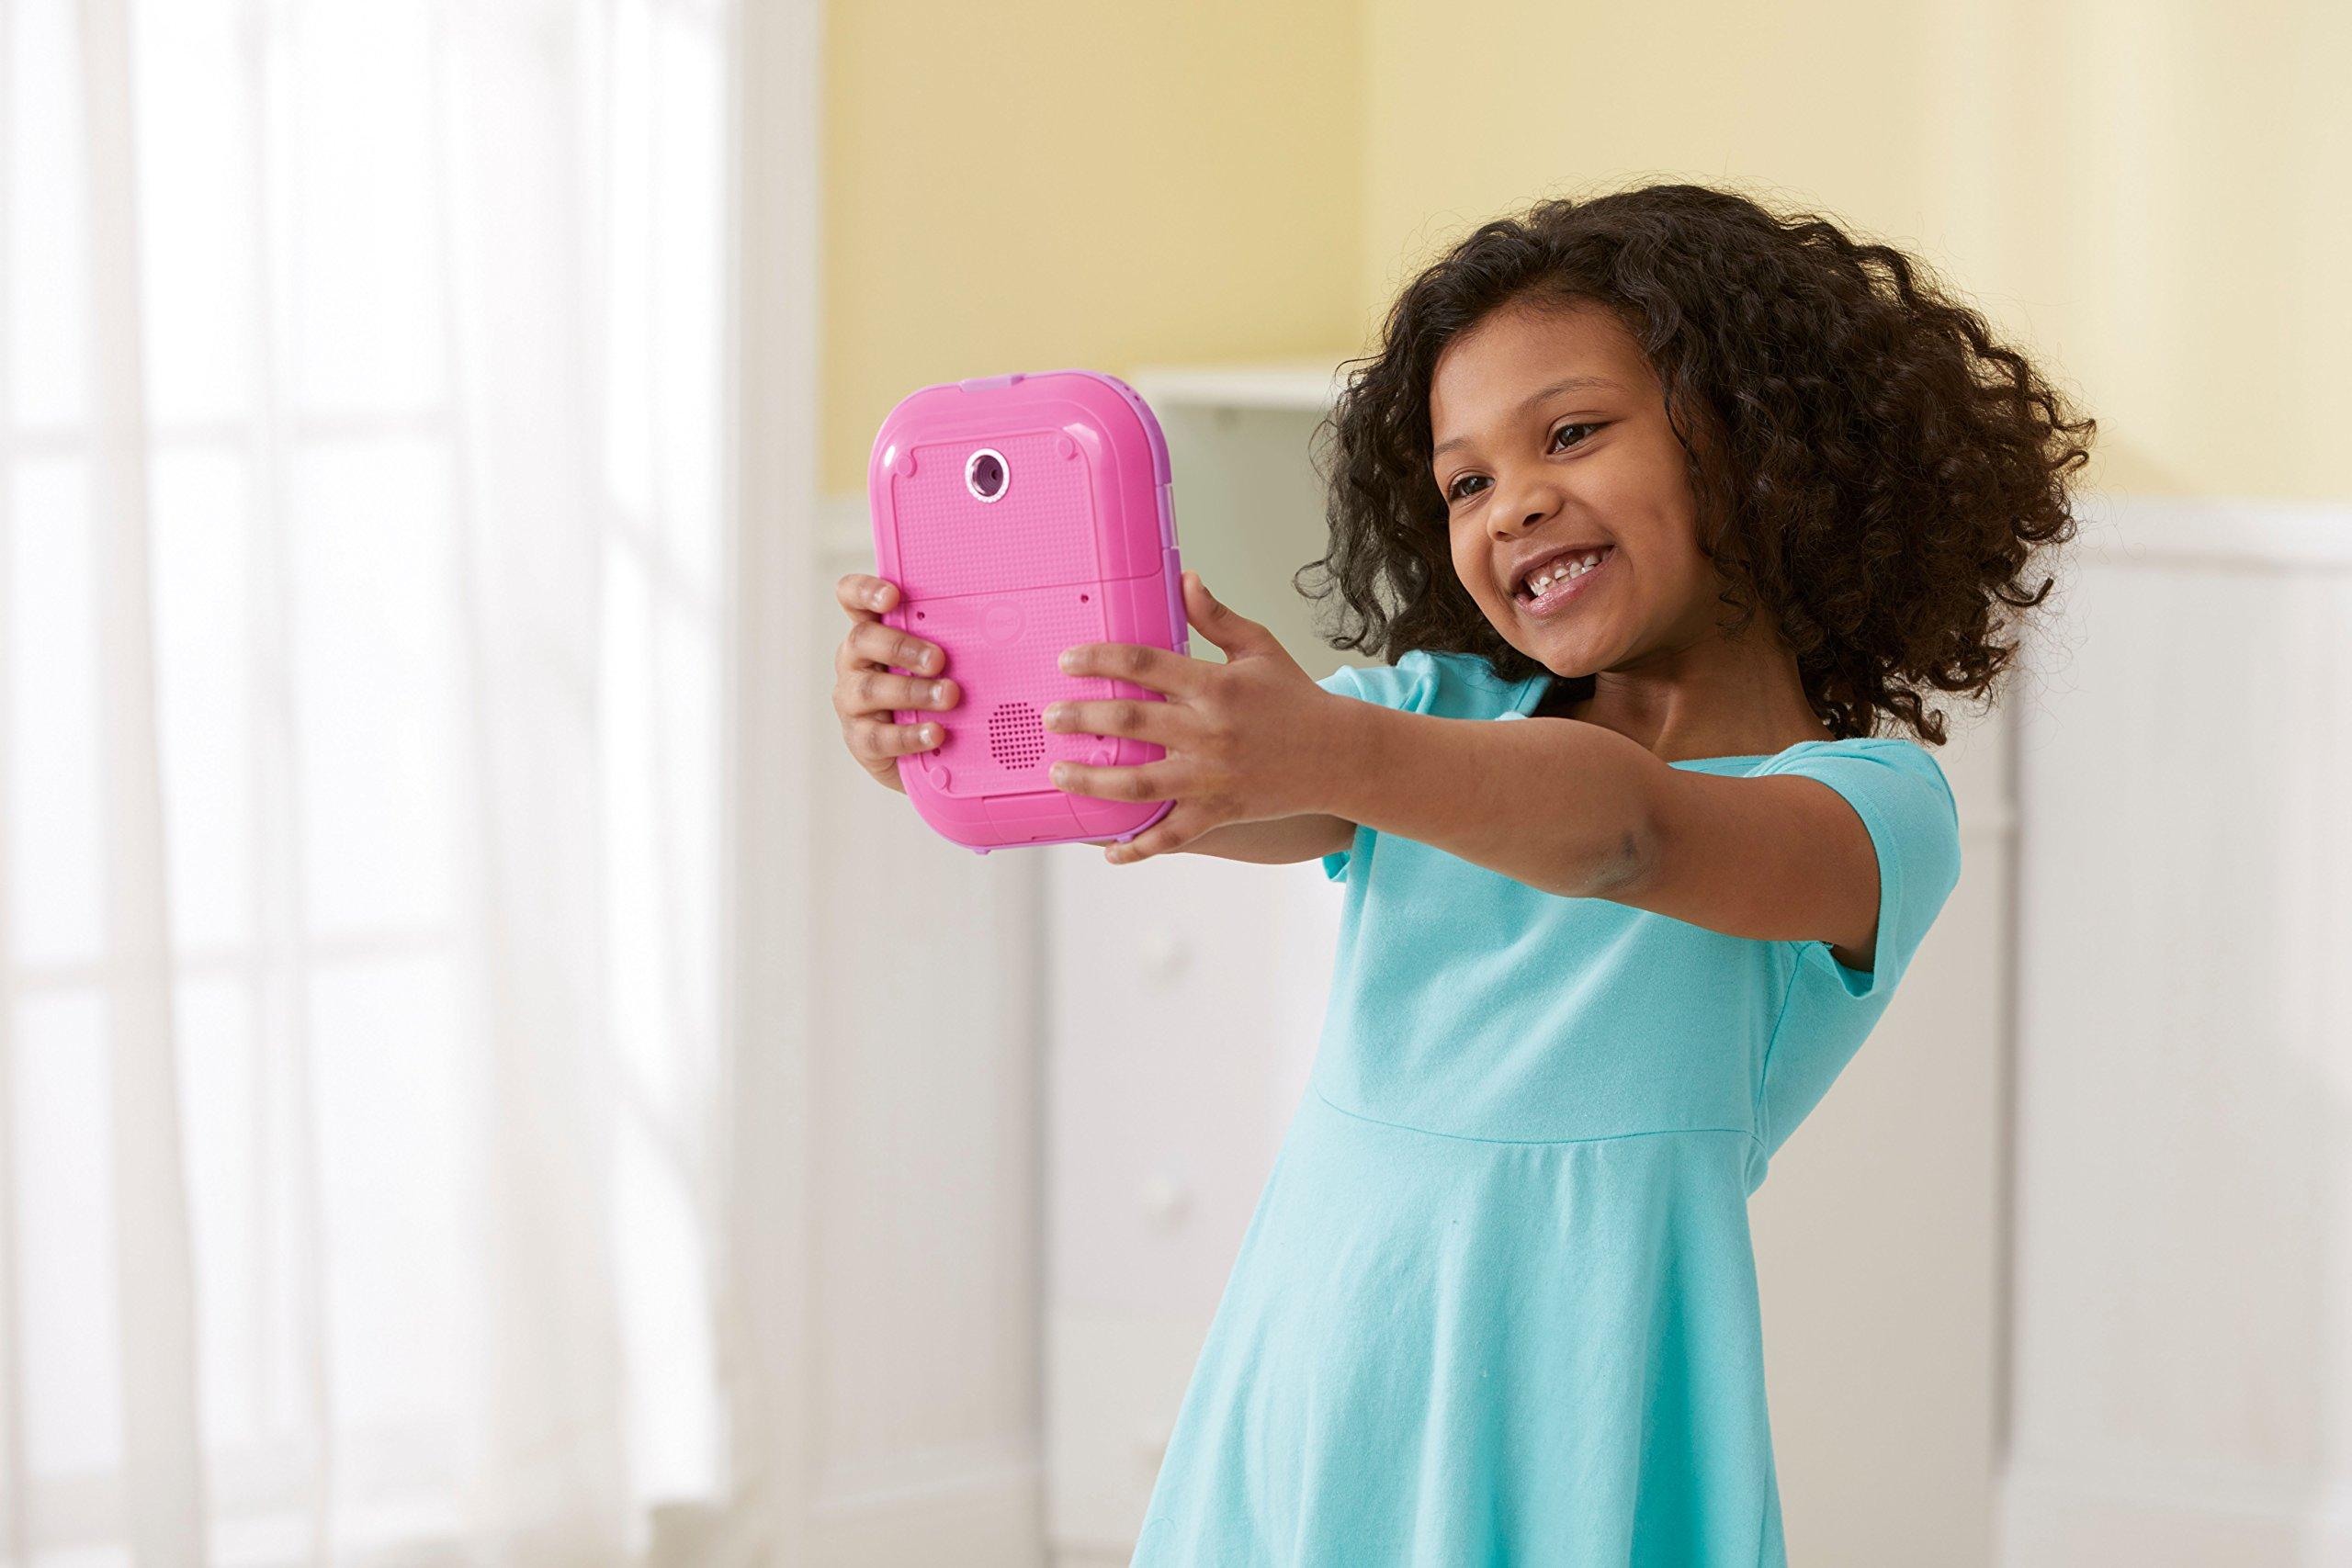 VTech Kidi Secrets Selfie Journal with Face Identifier, Pink by VTech (Image #4)